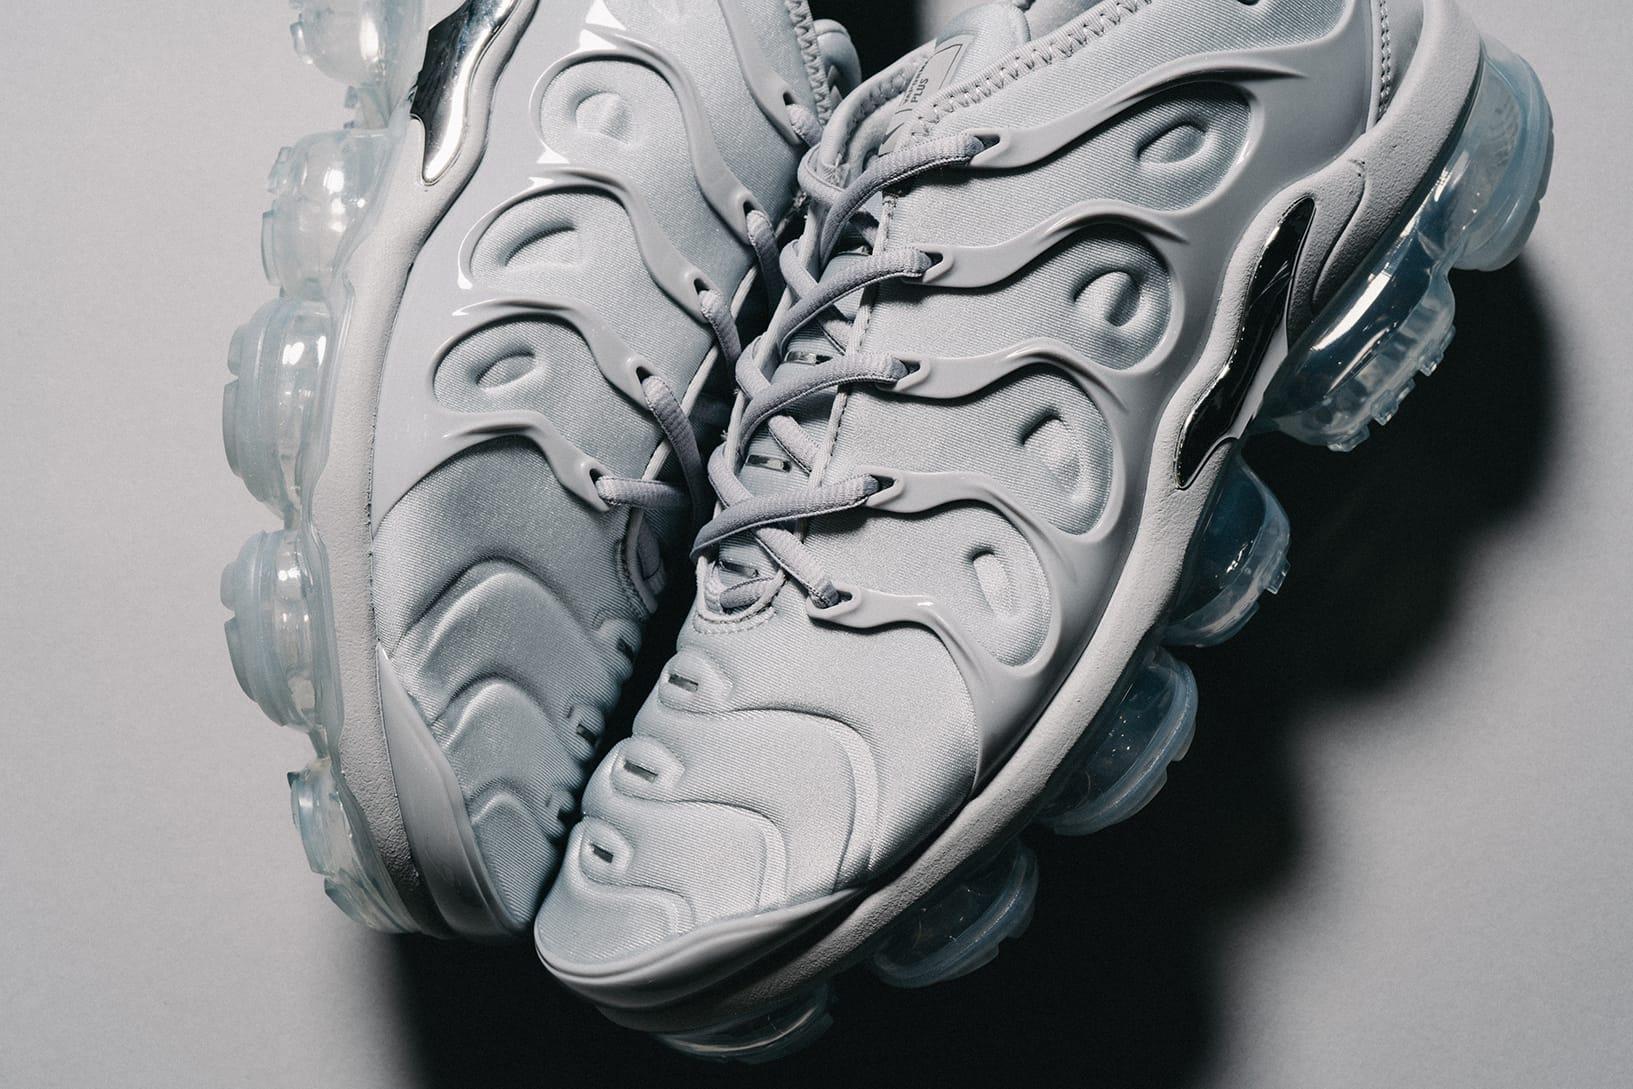 Nike Air VaporMax Plus Cool Gray Closer